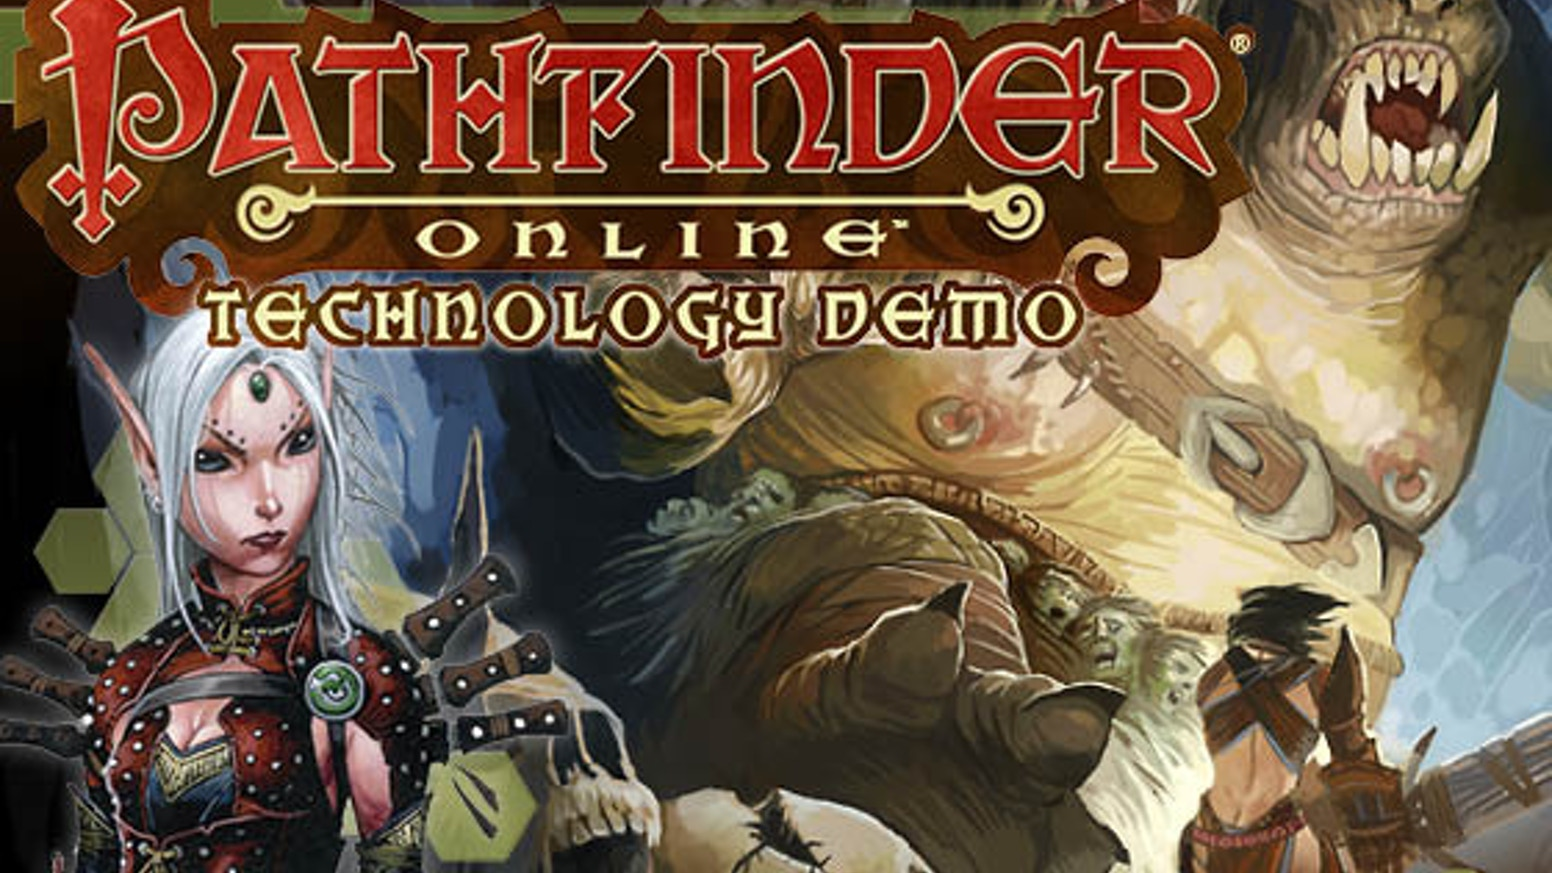 Pathfinder Online Technology Demo by Goblinworks Inc  — Kickstarter